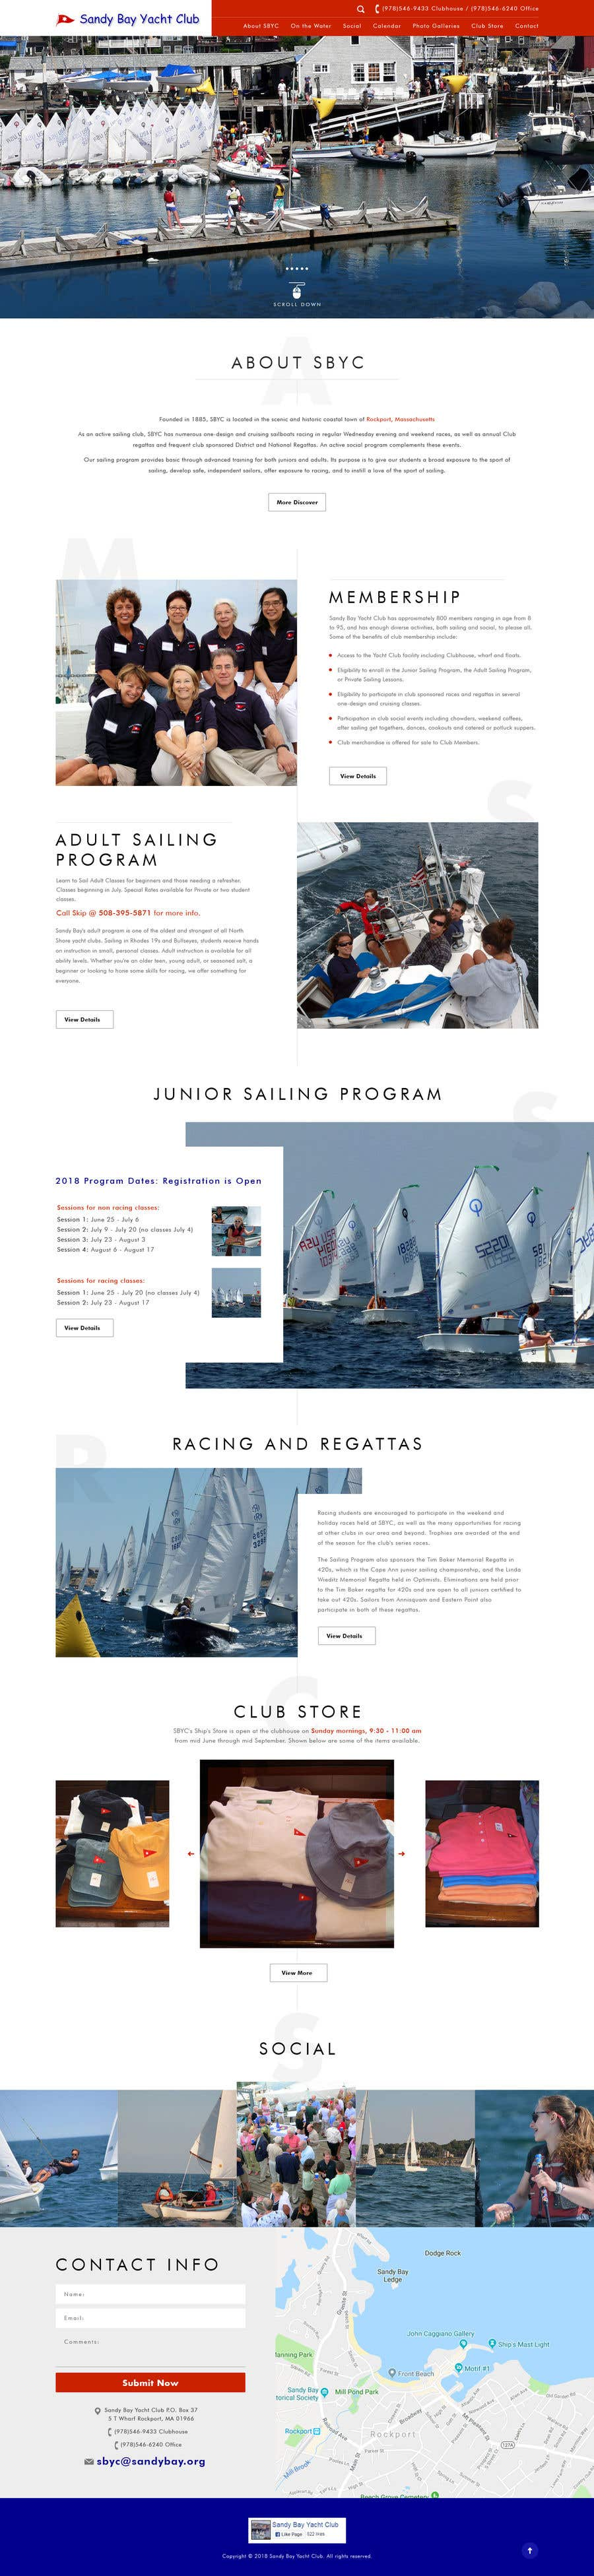 Bài tham dự cuộc thi #38 cho Design a Website for a US Yacht Club